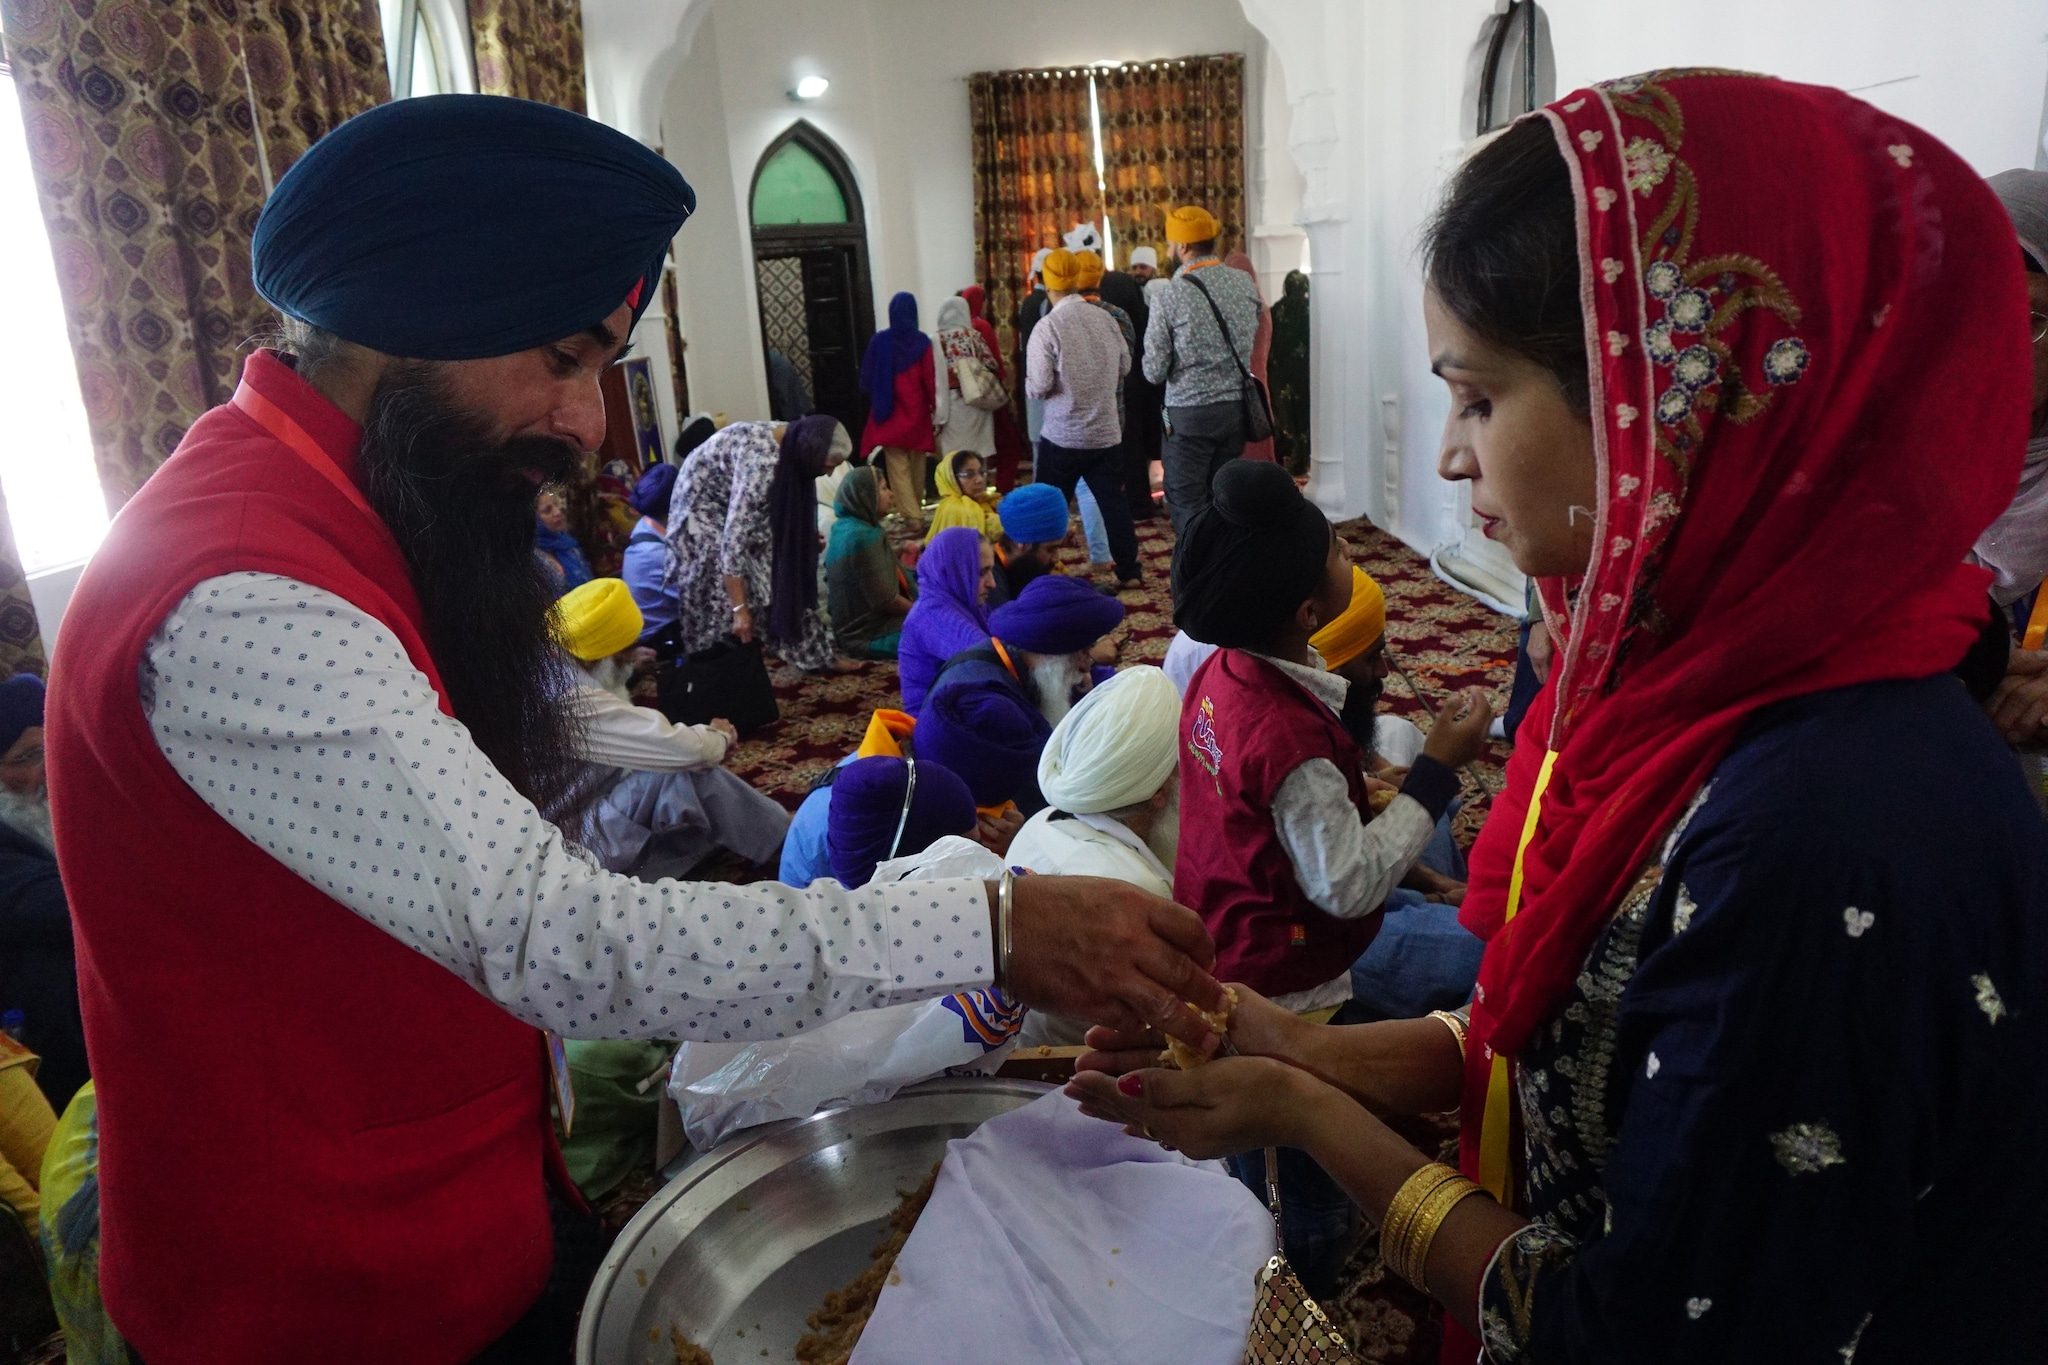 Pilgrims at the gurudwara.